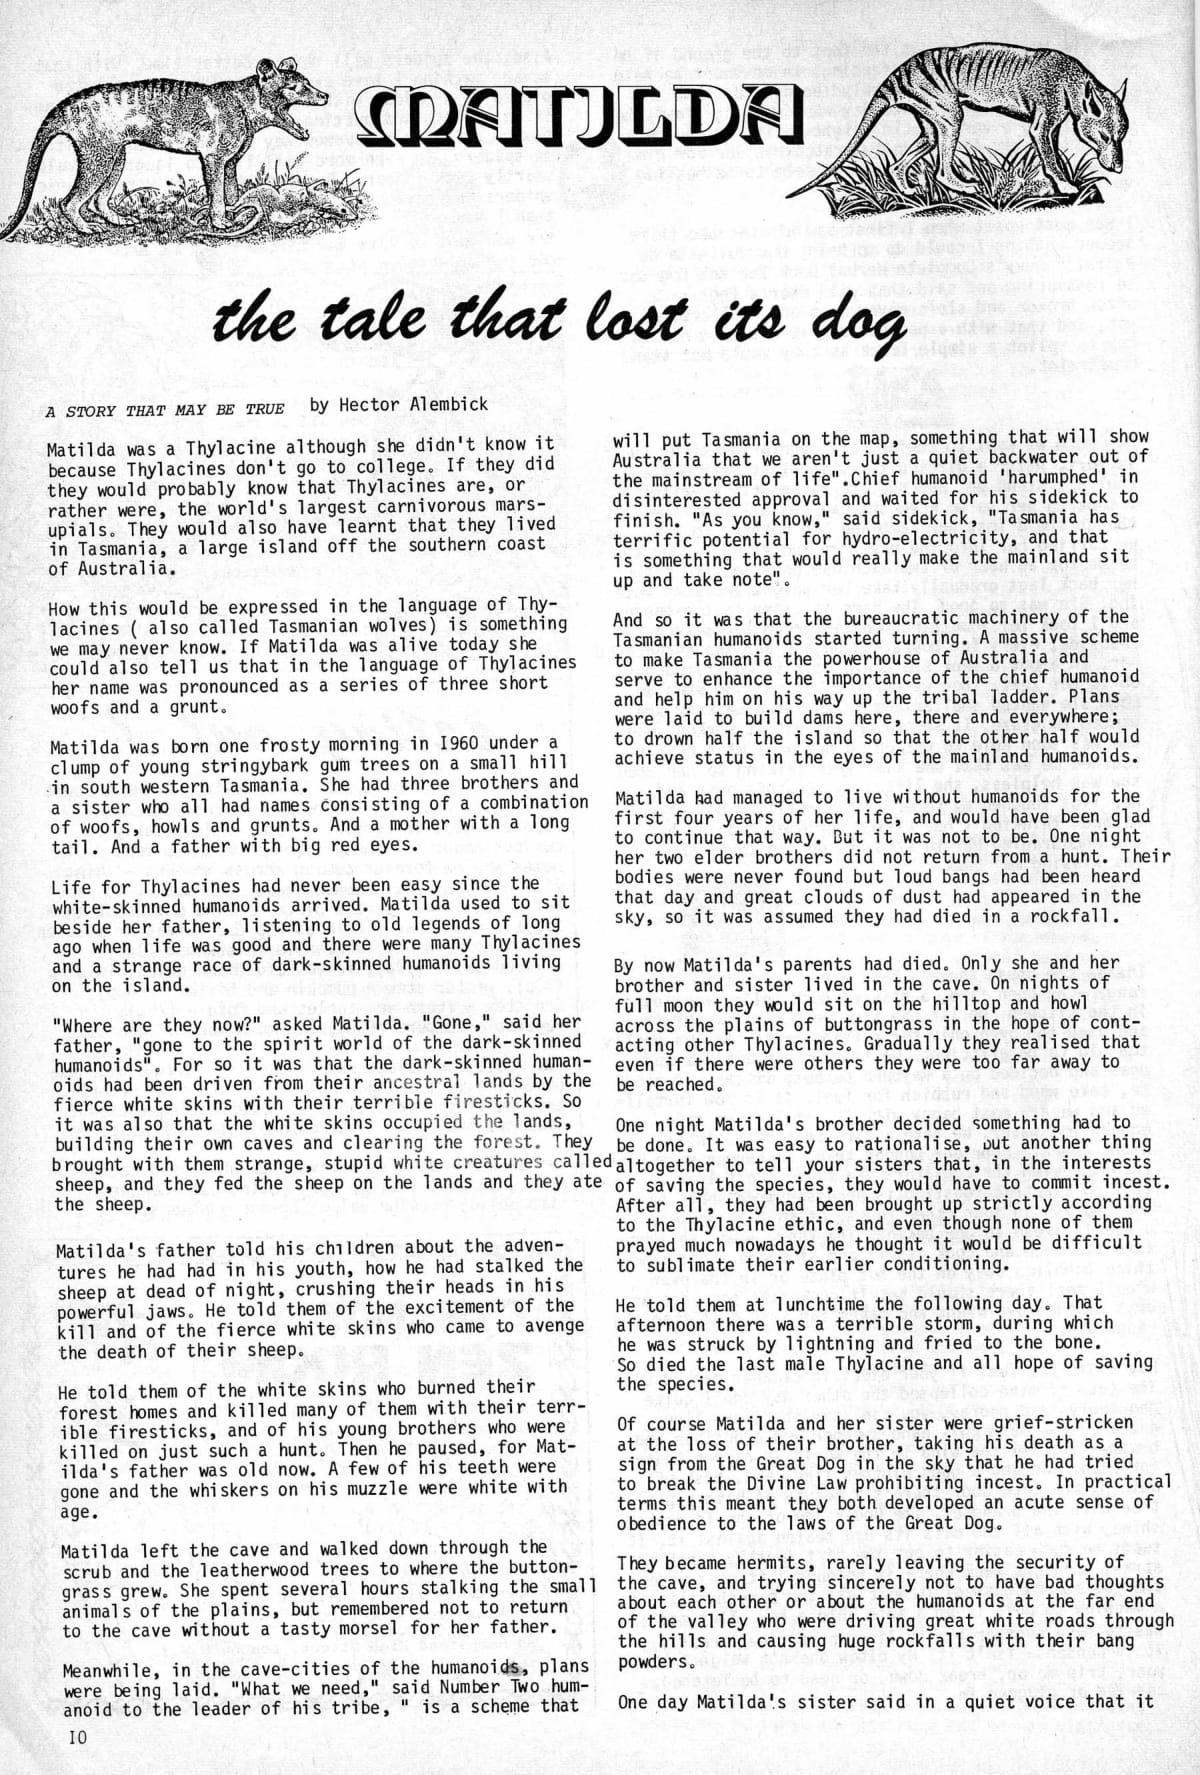 seed-v3-n4-april1974-10.jpg